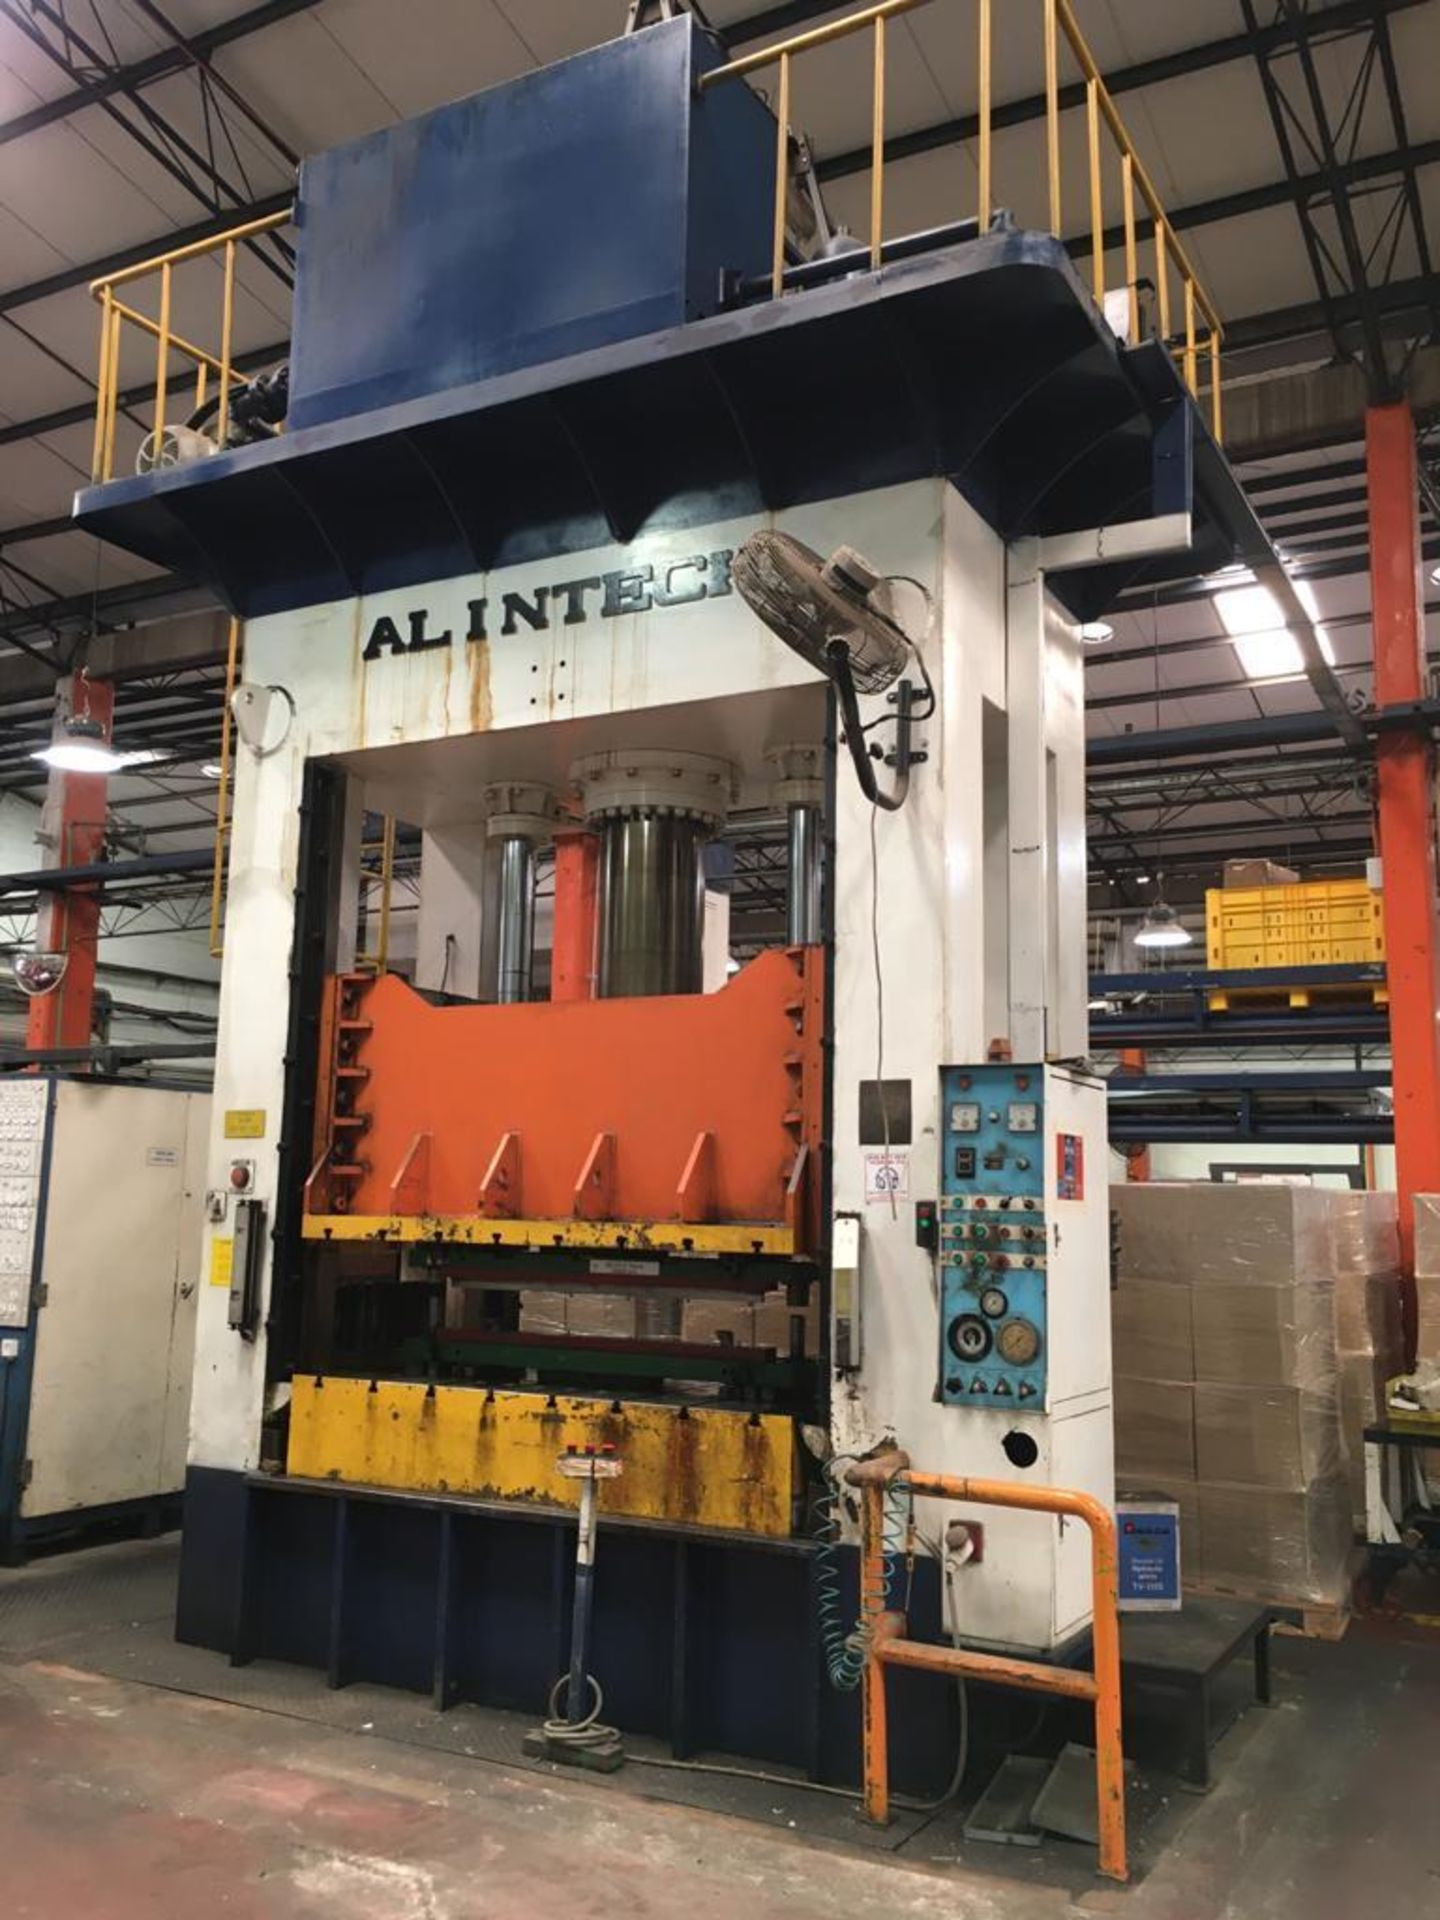 Lot 20 - ALINTECH 350 TON HYDRAULIC STAMPING PRESS; MODEL 350-H